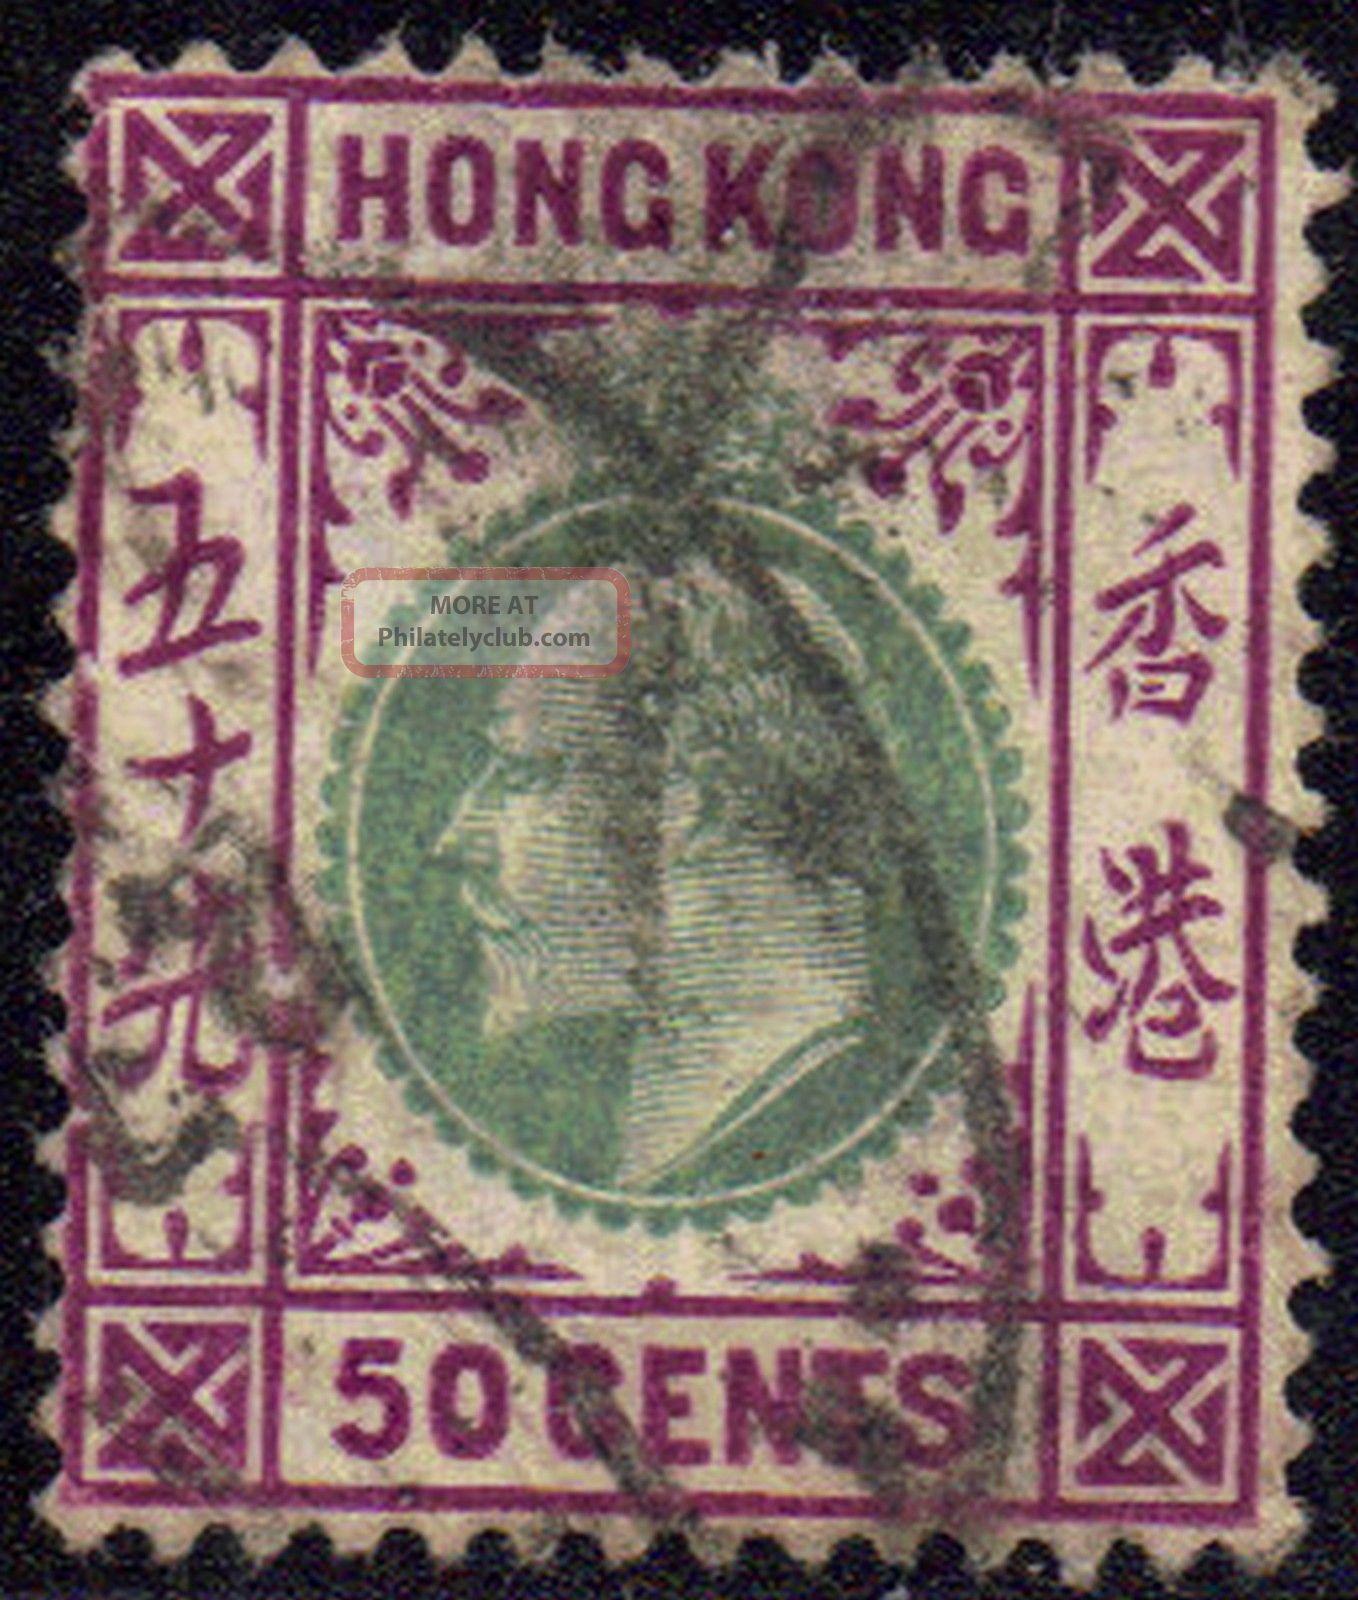 Hong Kong 1903 50c Sg 71 Scot 80 Cds British Colonies & Territories photo